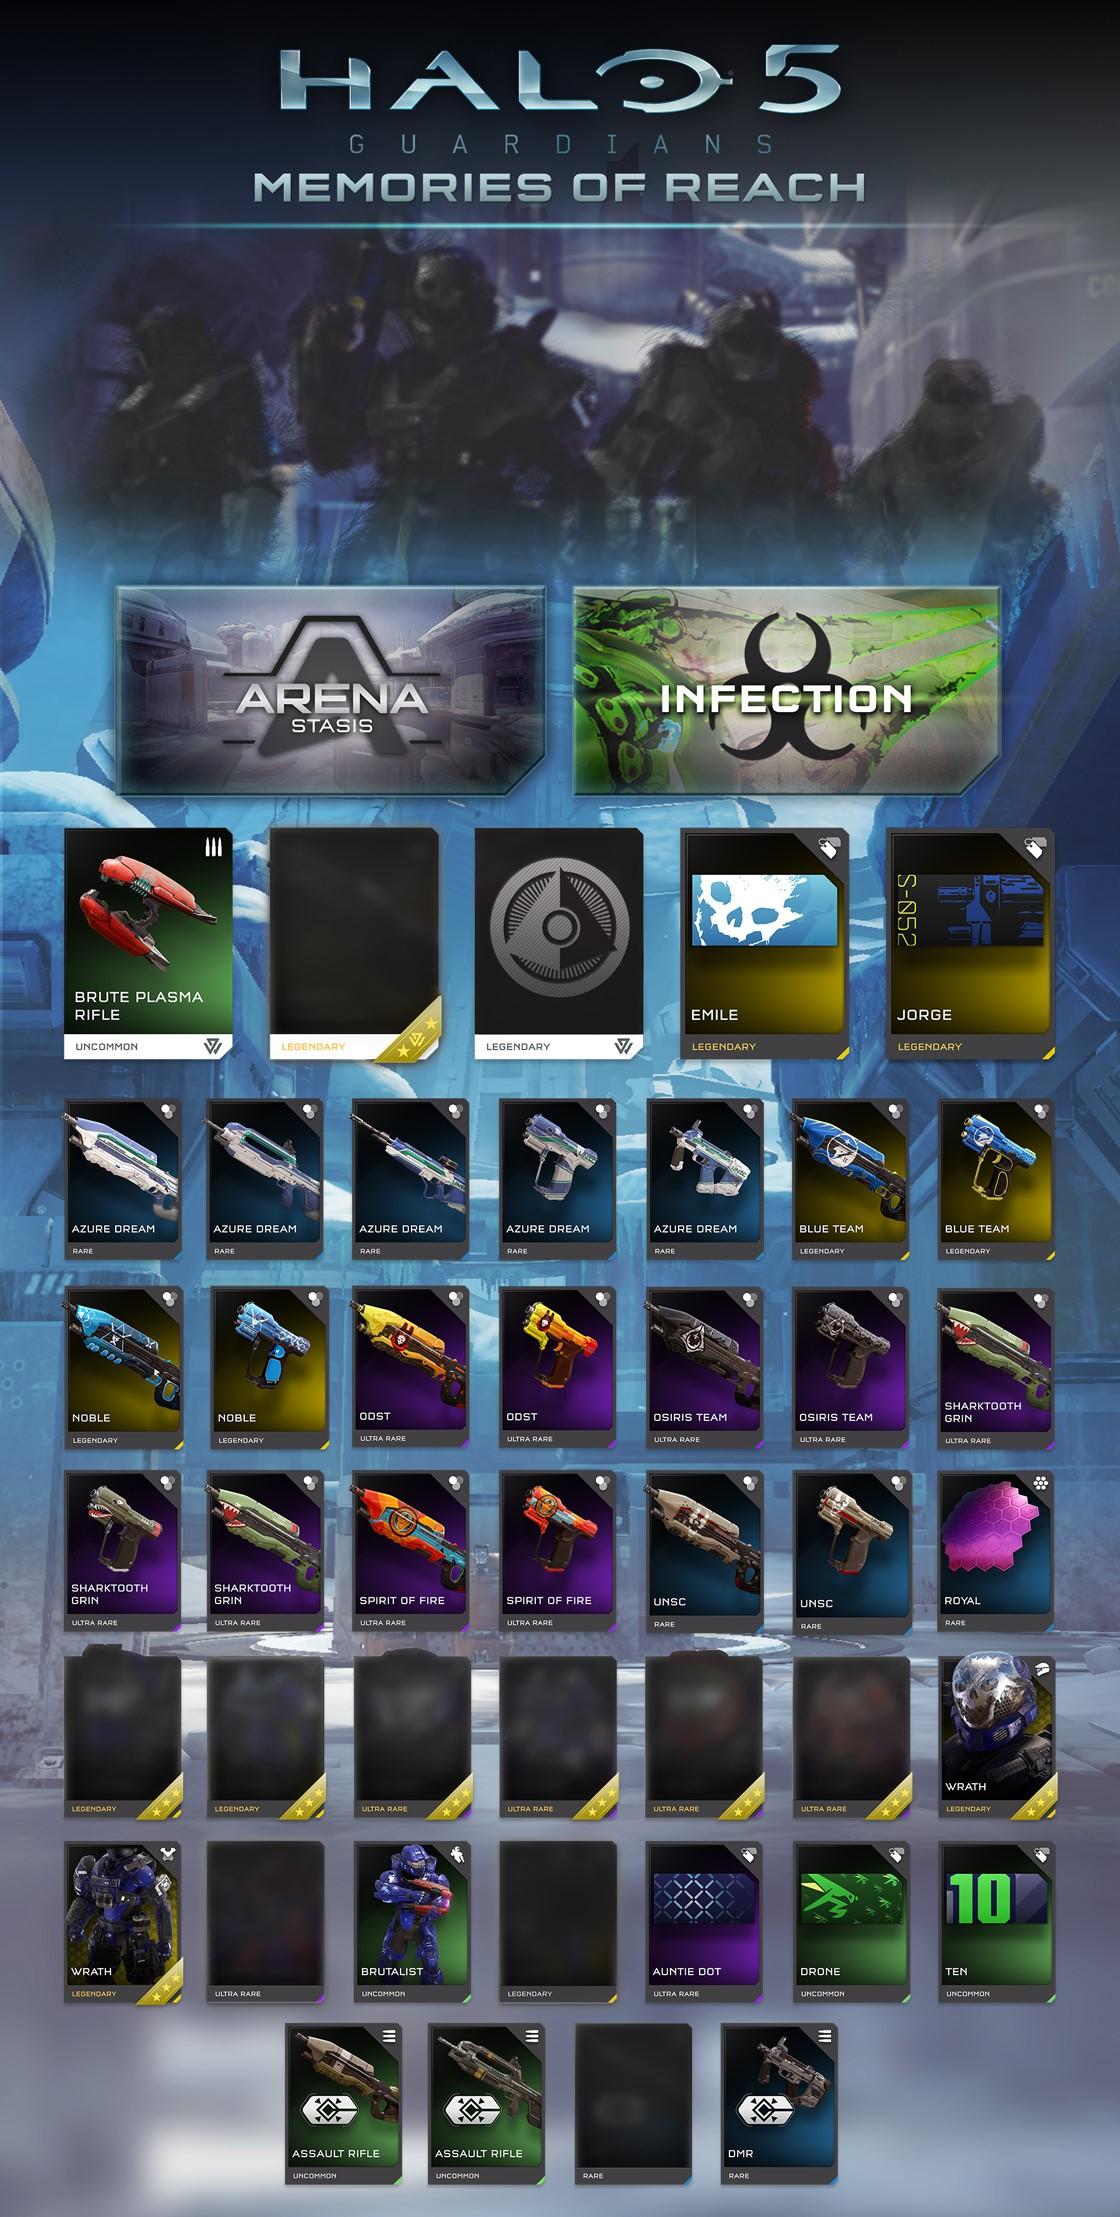 Halo 5: Guardians Reveals Memories of Reach REQs, New Weapon